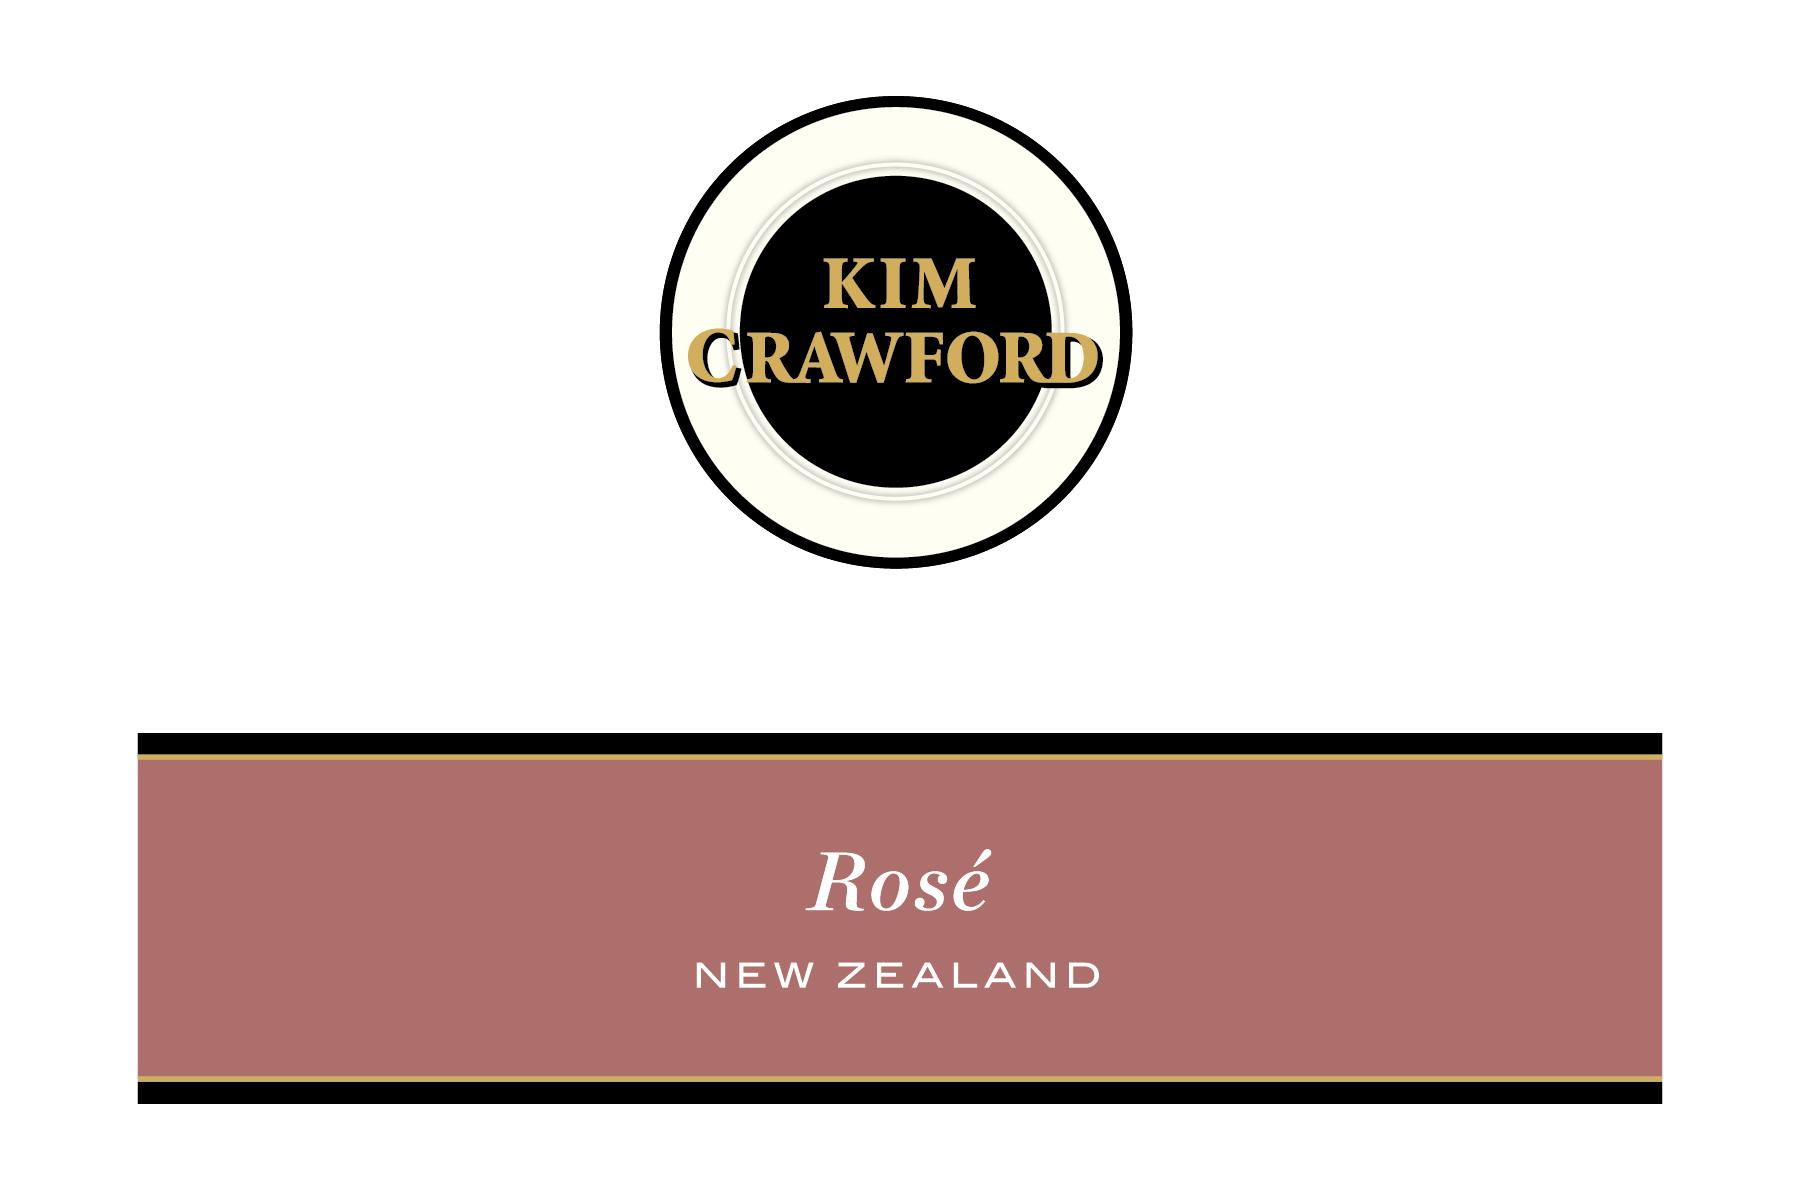 Kim Crawford Rosé